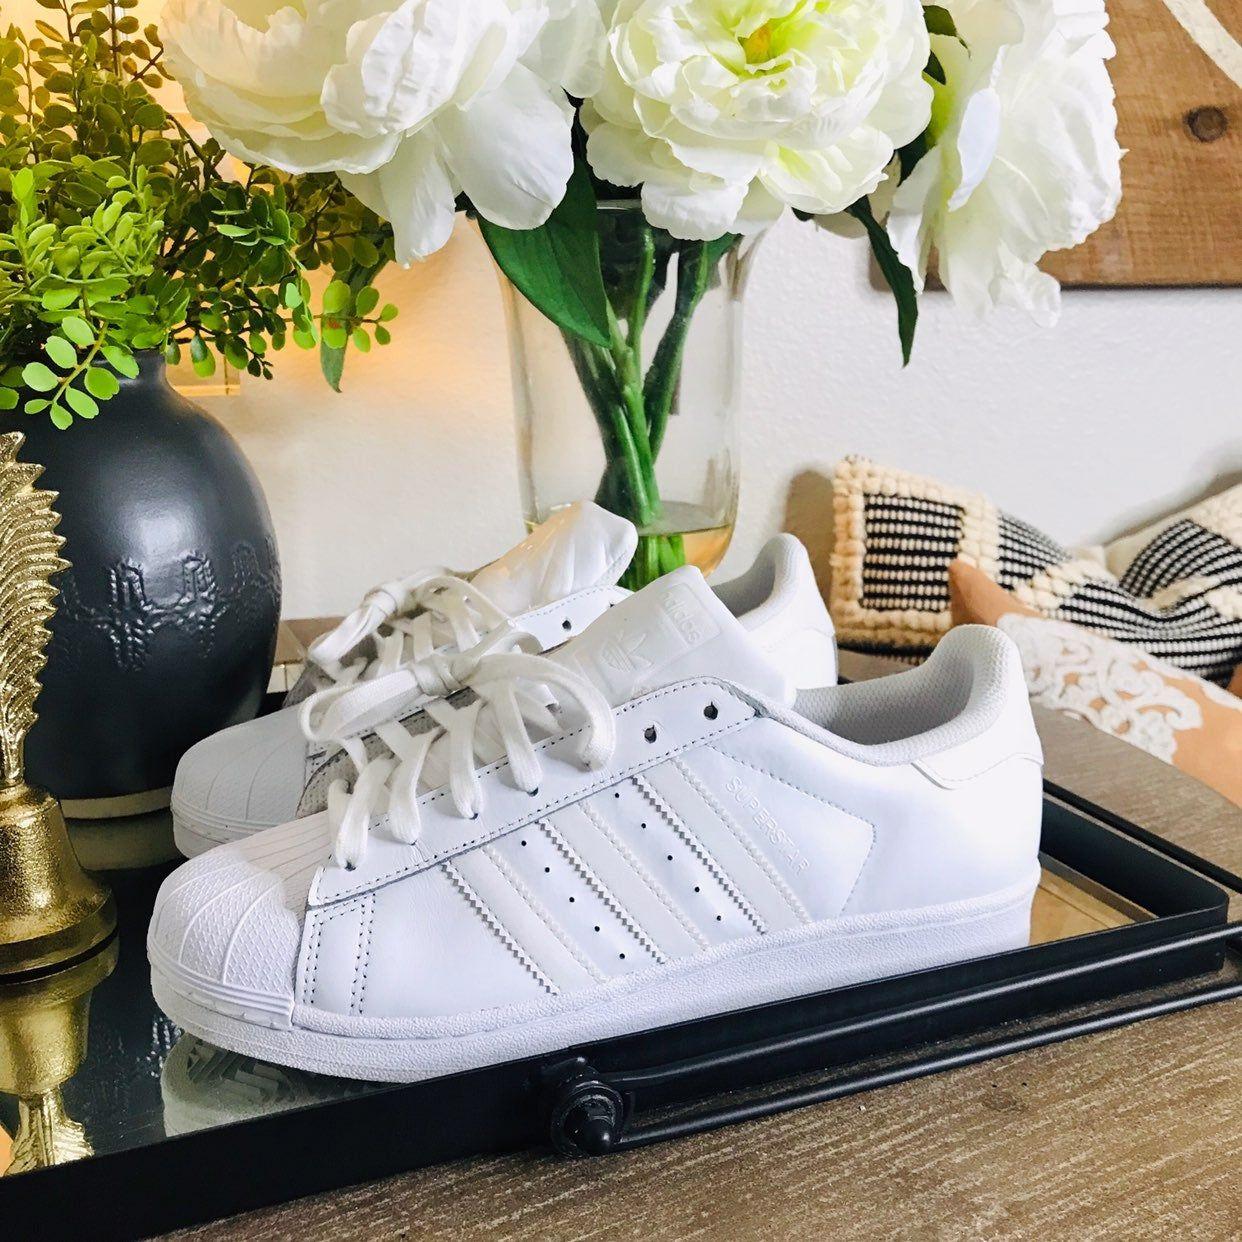 Adidas ART S85139 Sz 9 Women's/Men's 7